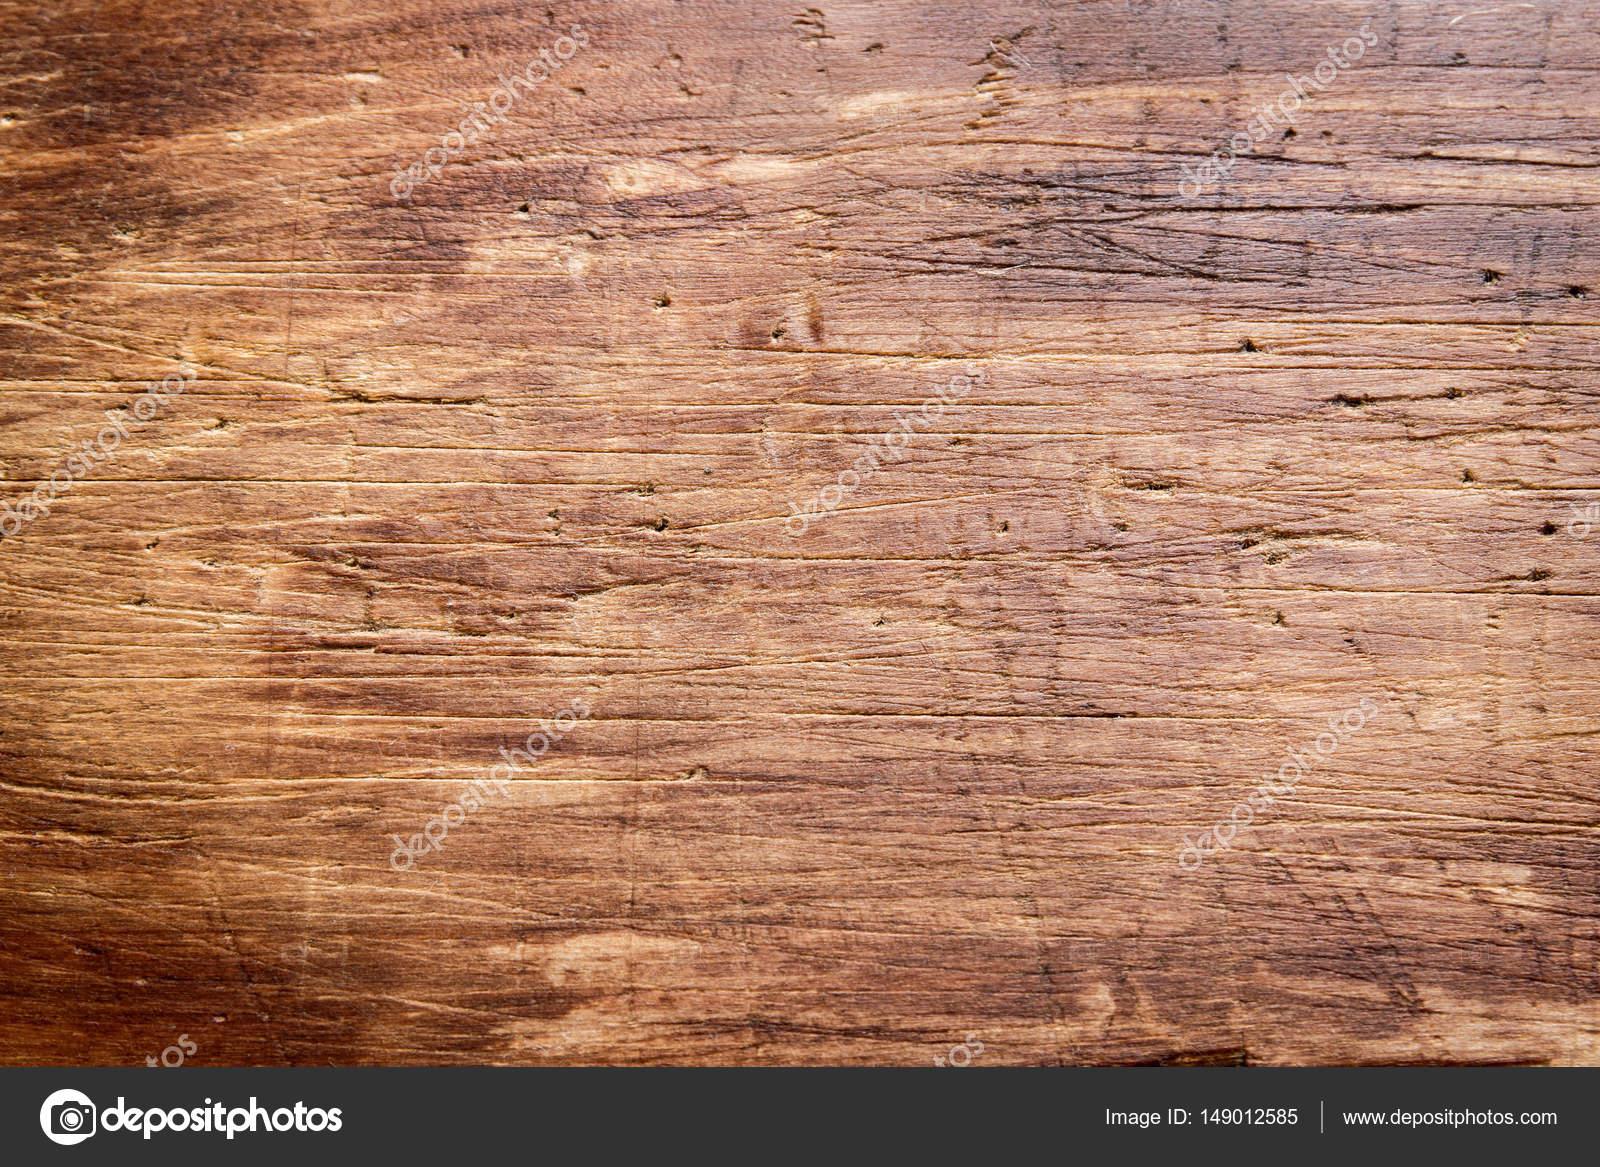 Rustic Wooden Cutting Board Background Close Rustic Empty Copy Space Stock Photo C Mizina 149012585